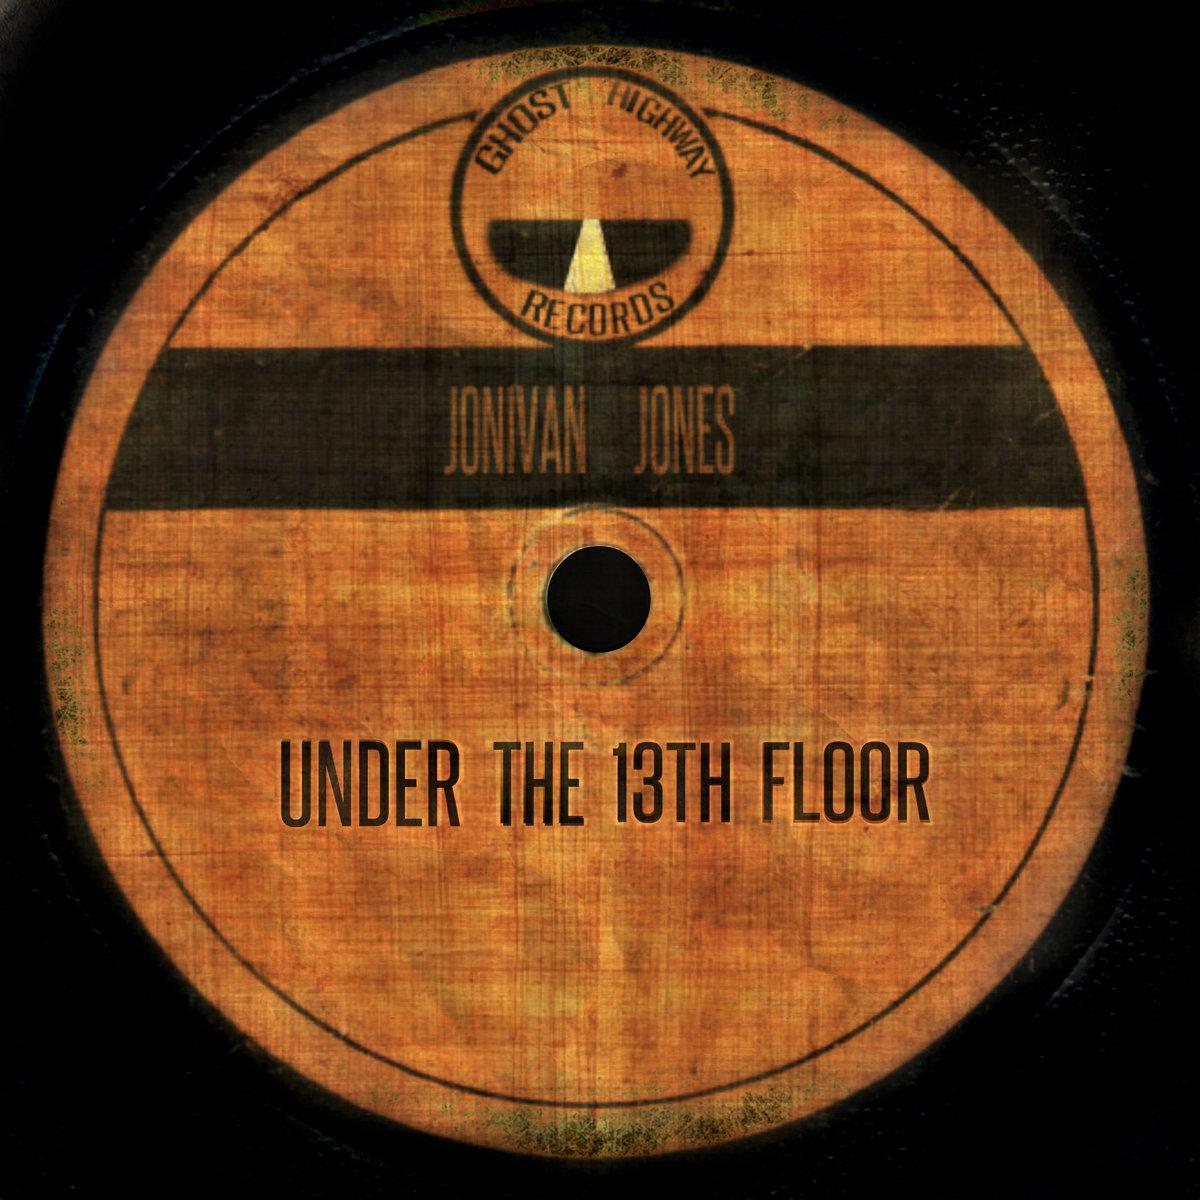 Under the 13th floor jonivan jones under the 13th floor by jonivan jones tyukafo